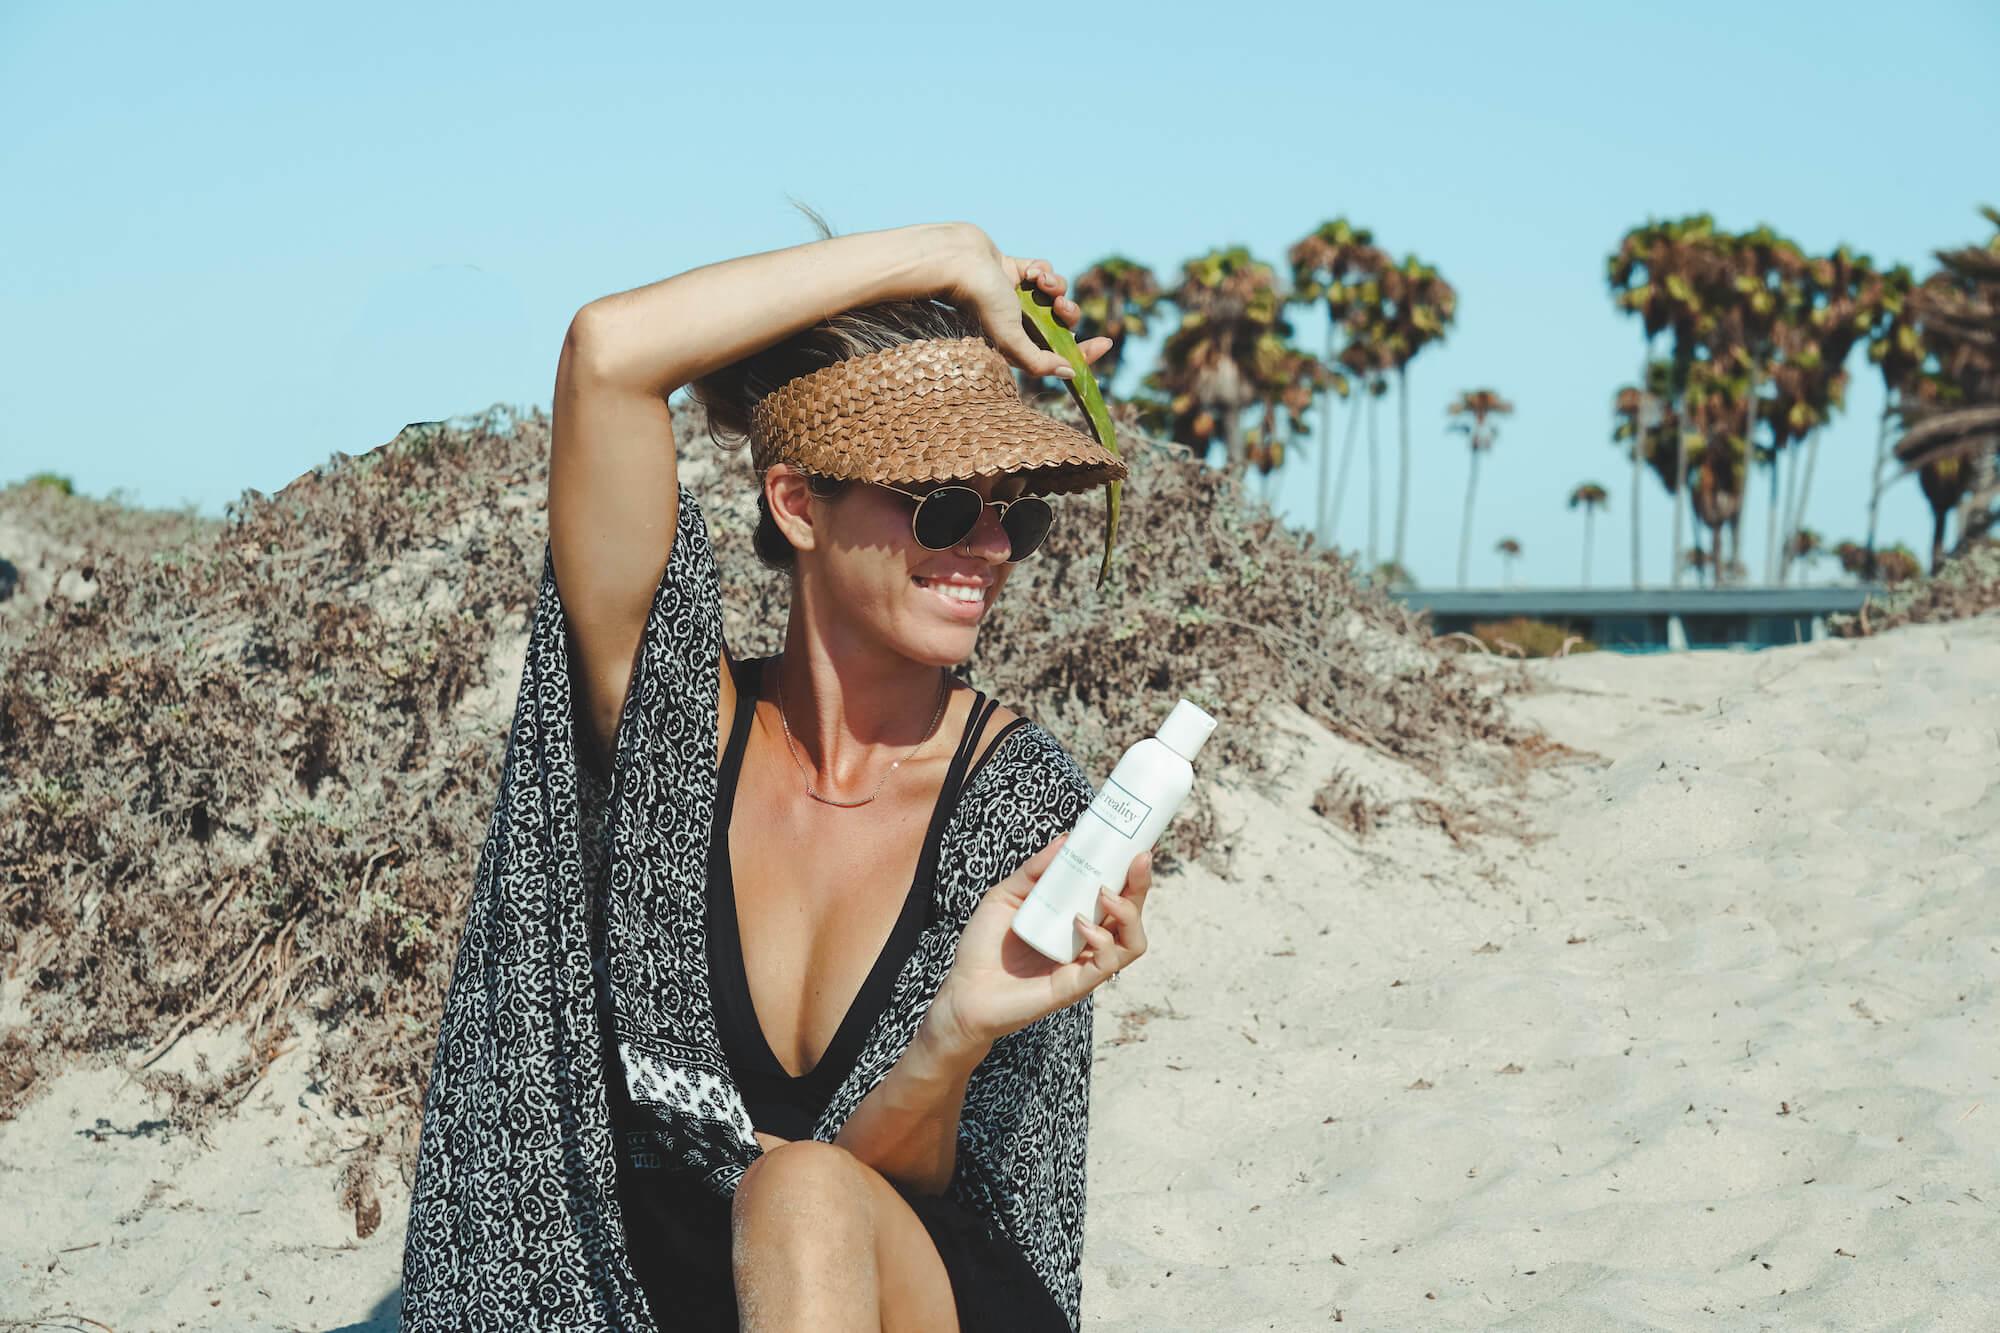 aloe vera uses with skin